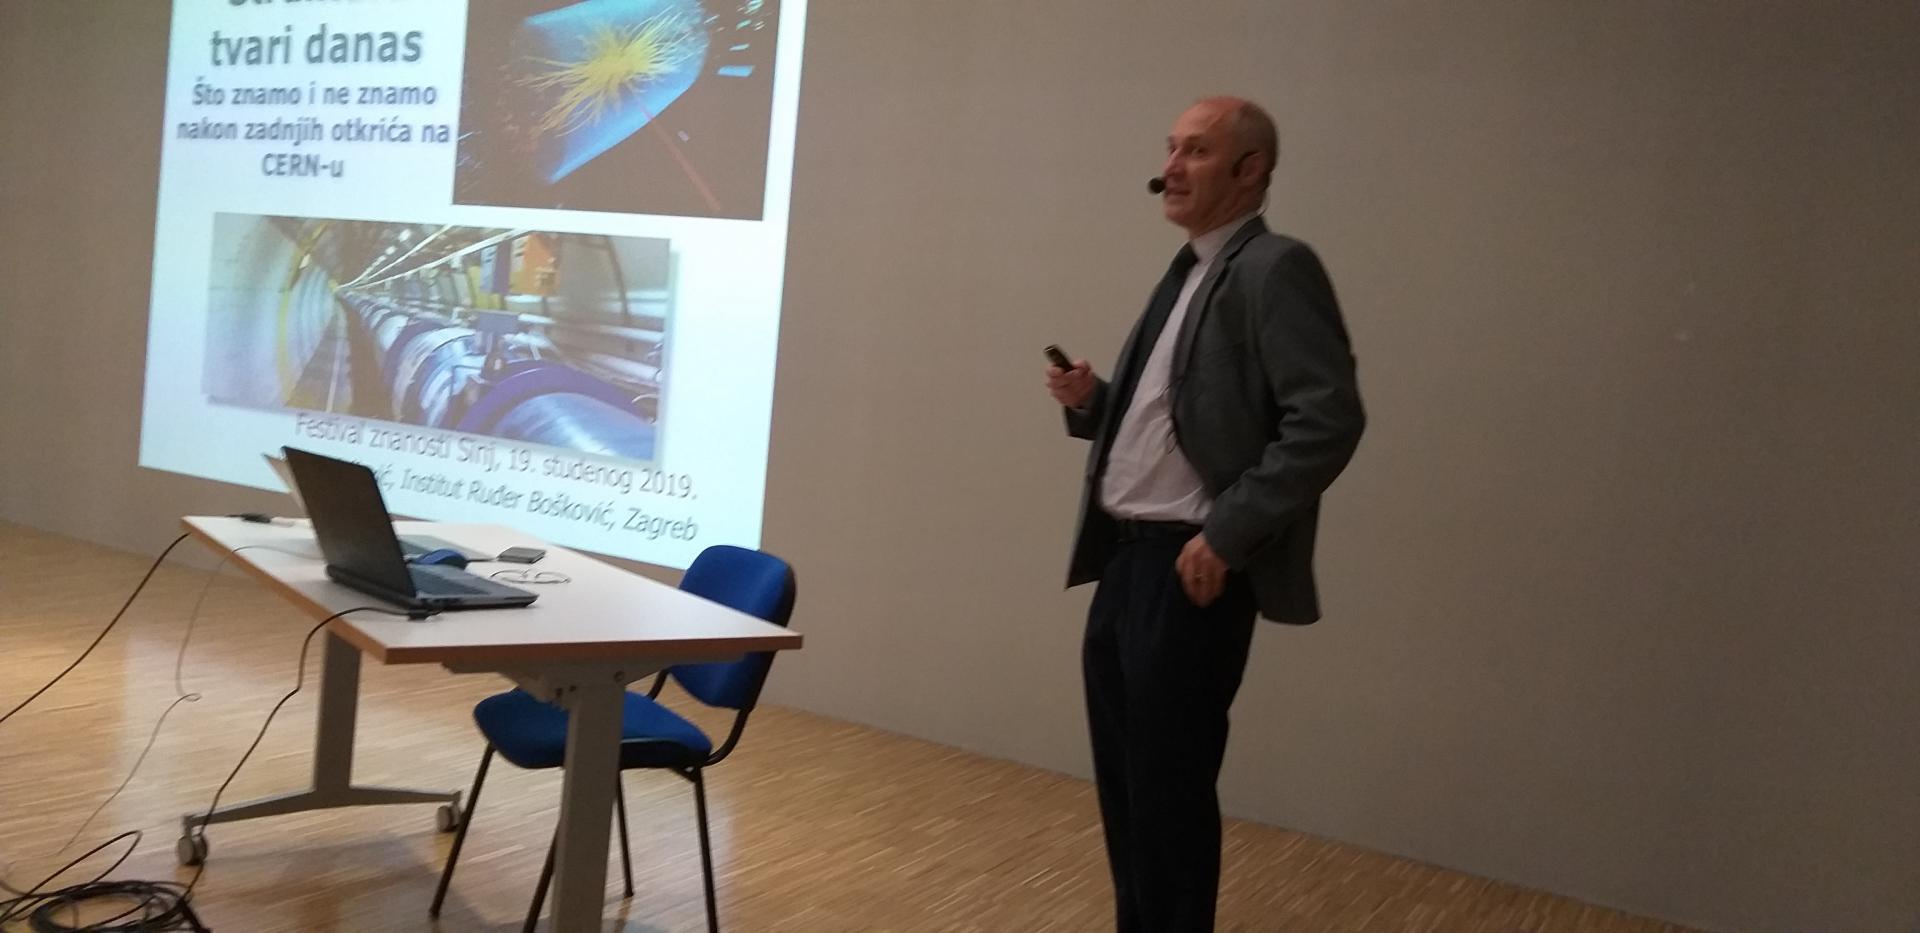 Prvi predavač na 10. Festivalu znanosti Sinj bio je dr. sc. Vuko Brigljević